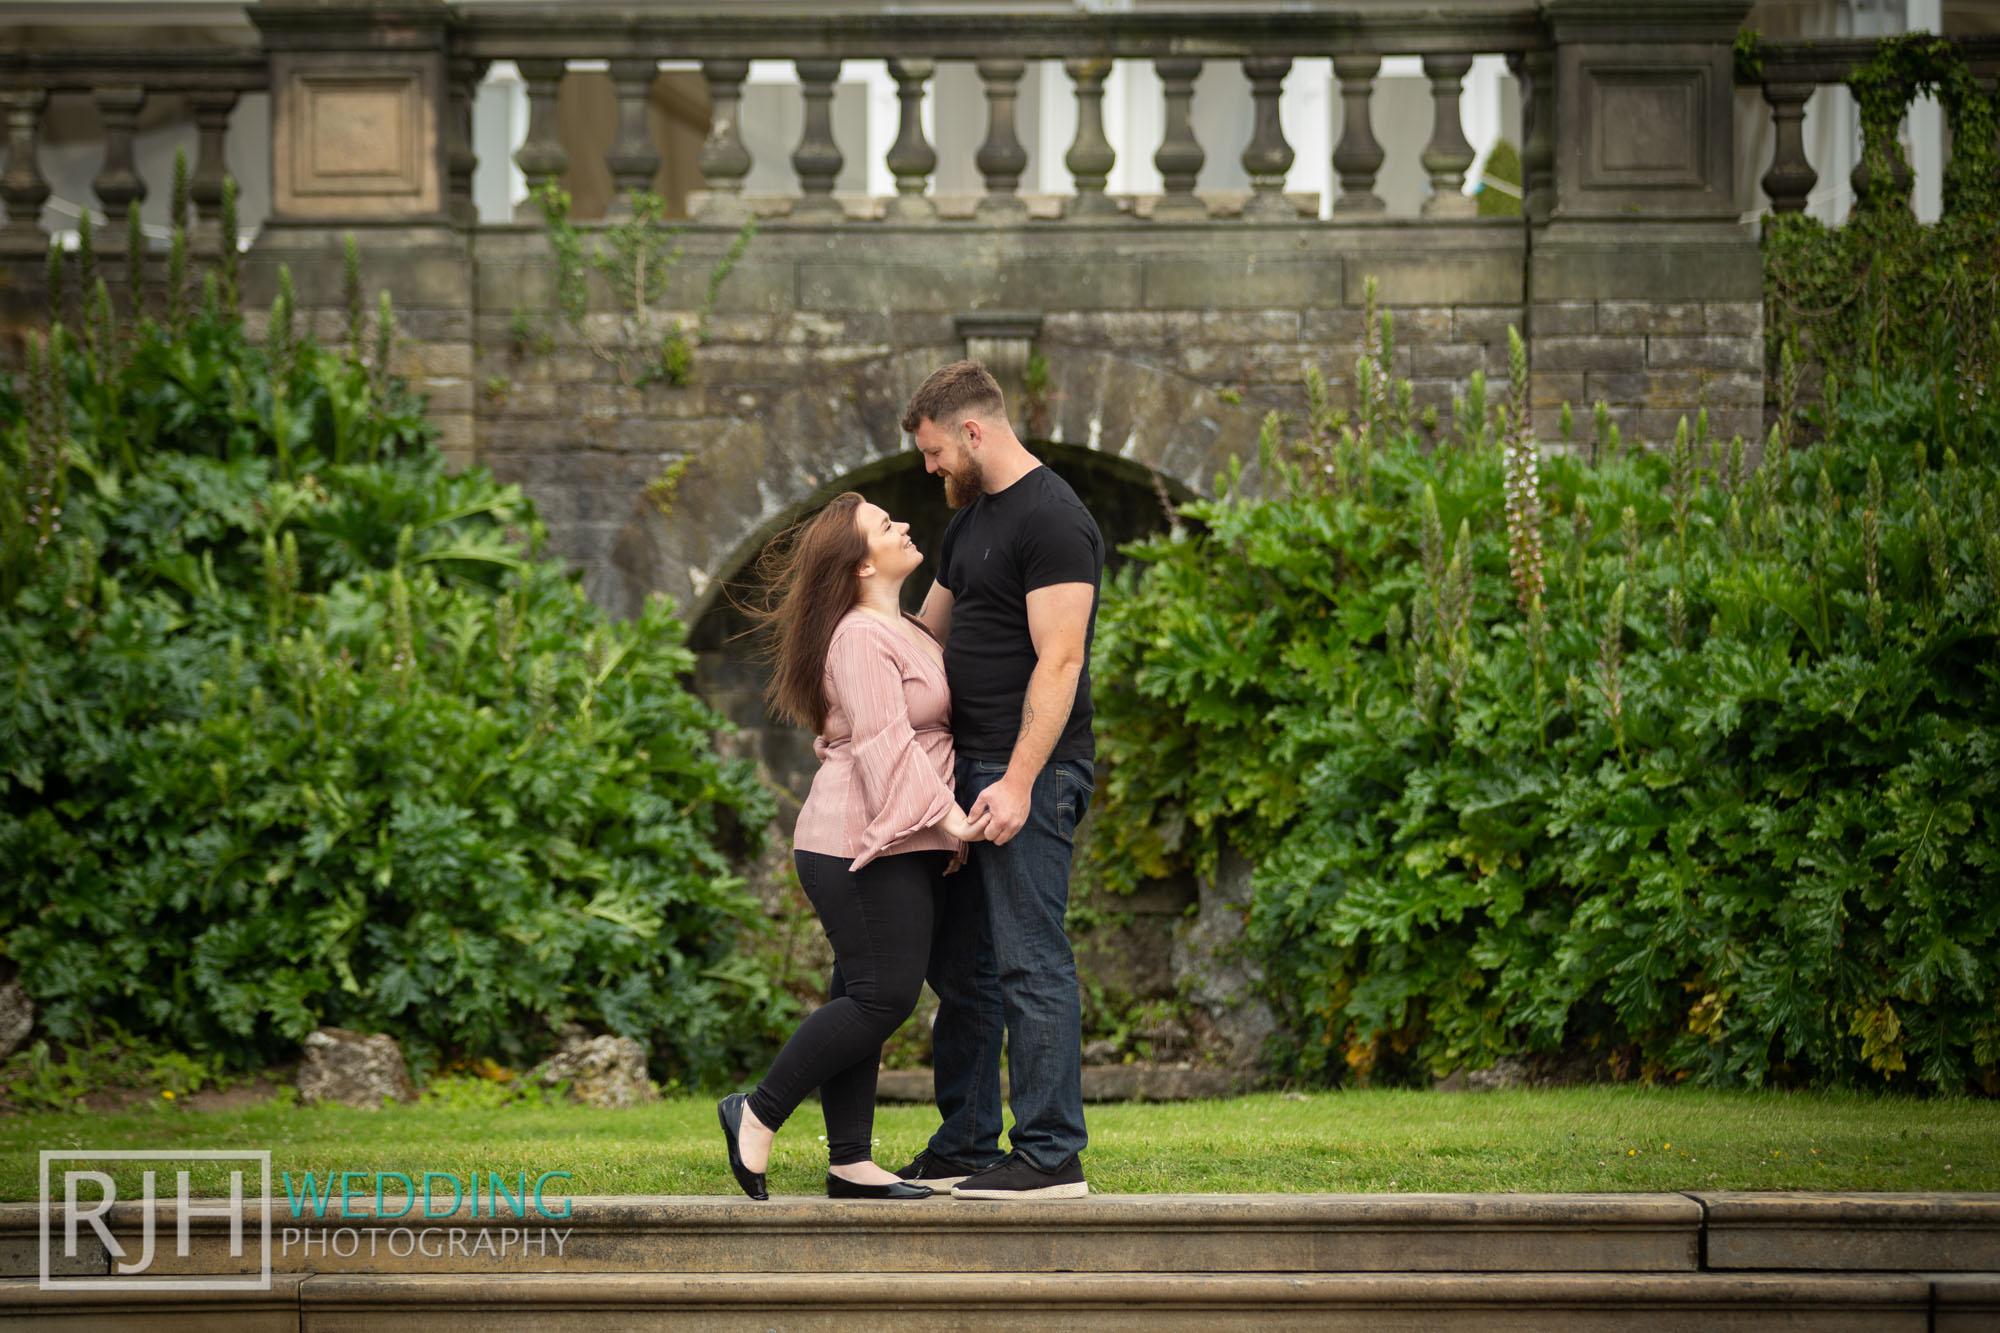 Osmaston Park Wedding Photographer - Jodie & Oli_029_IMG_7585.jpg